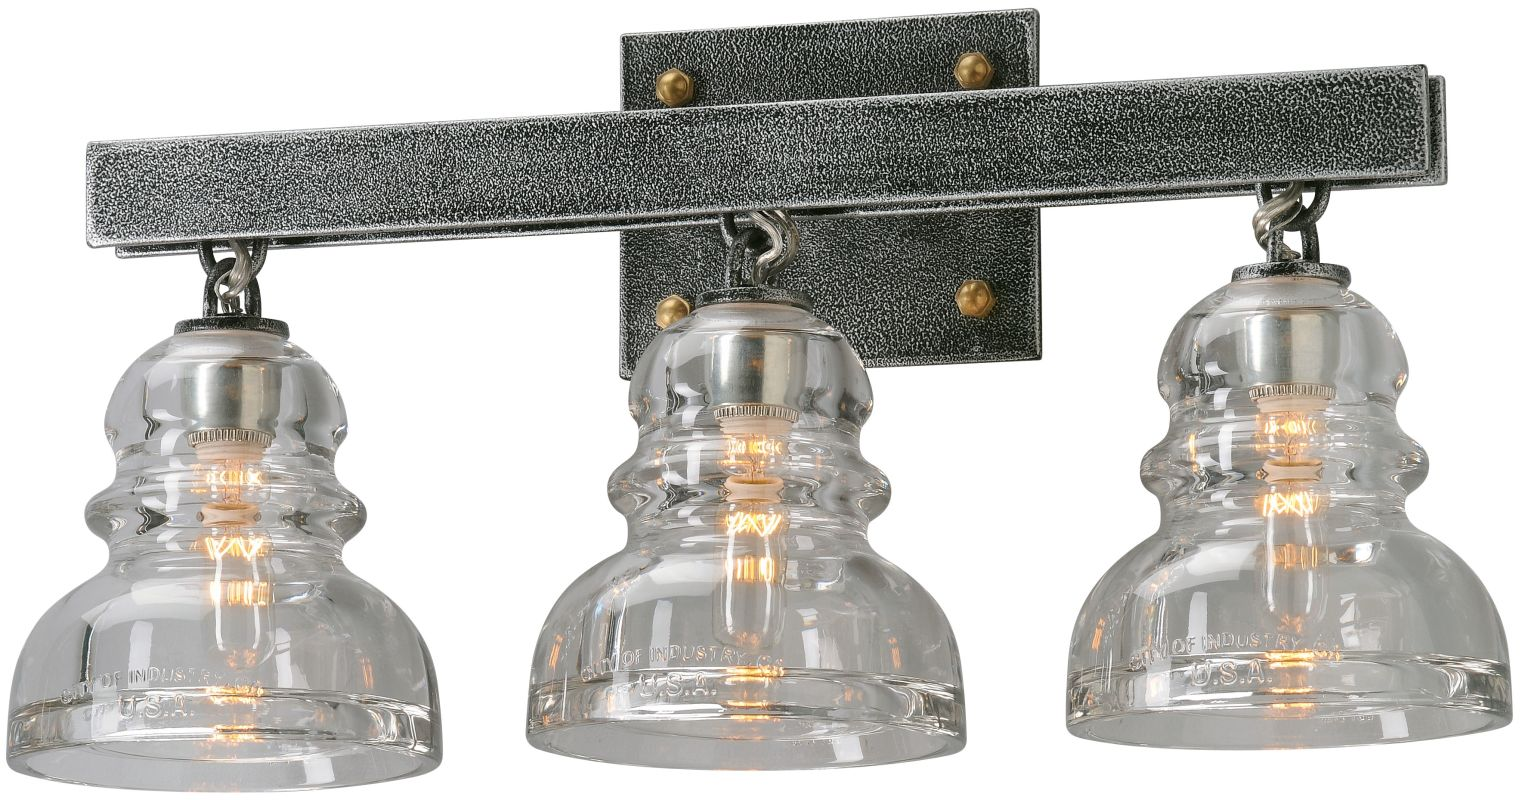 Troy Lighting B3953 Old Silver Menlo Park 3 Light Bathroom Vanity Light With Glass Insulator